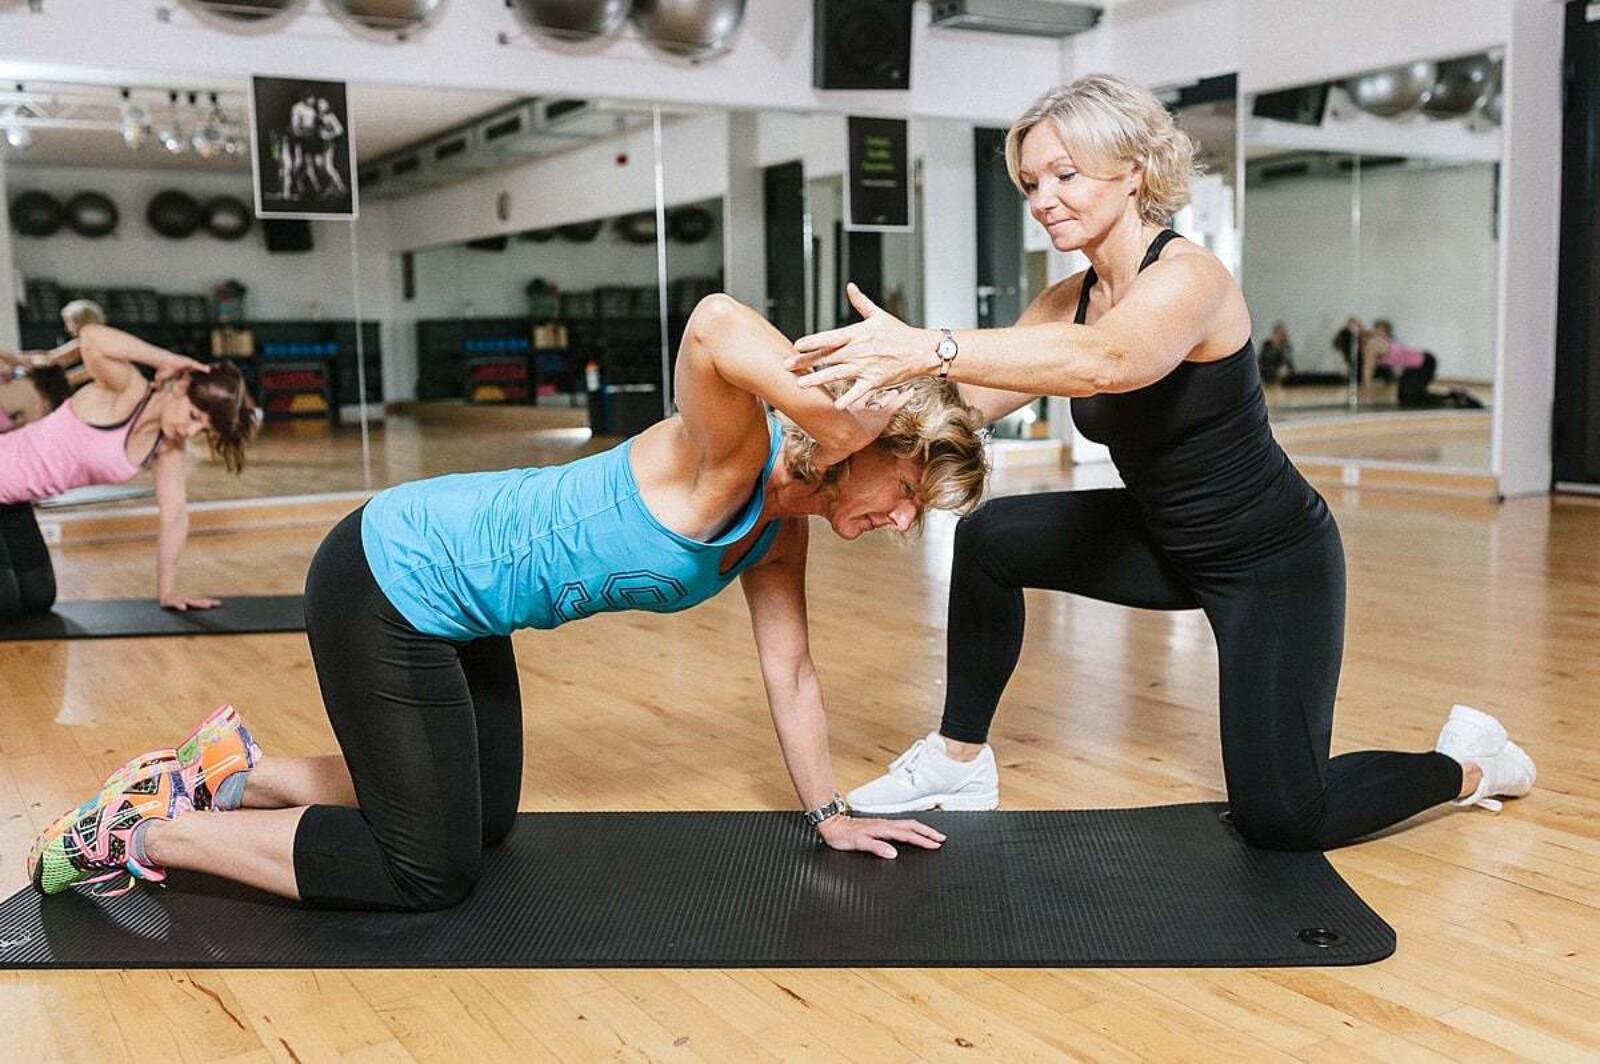 Gezieltes Rückentraining im LadyFit Bamberg. So stärkst du deine Rückenmuskulatur.